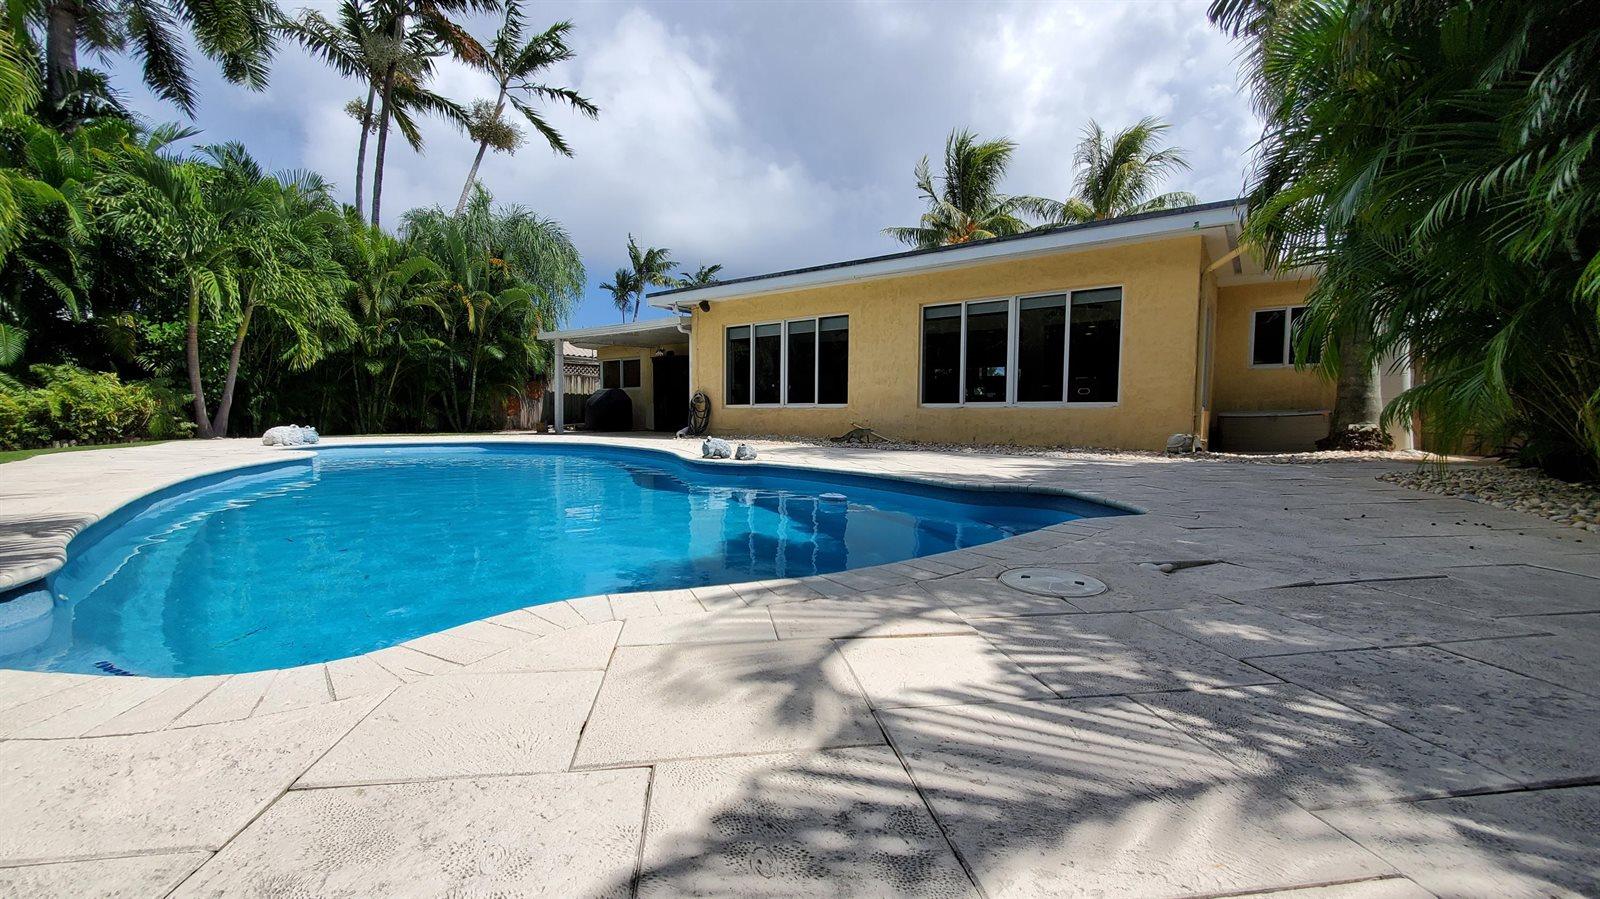 2101 NE 15th Street, Fort Lauderdale, FL 33304